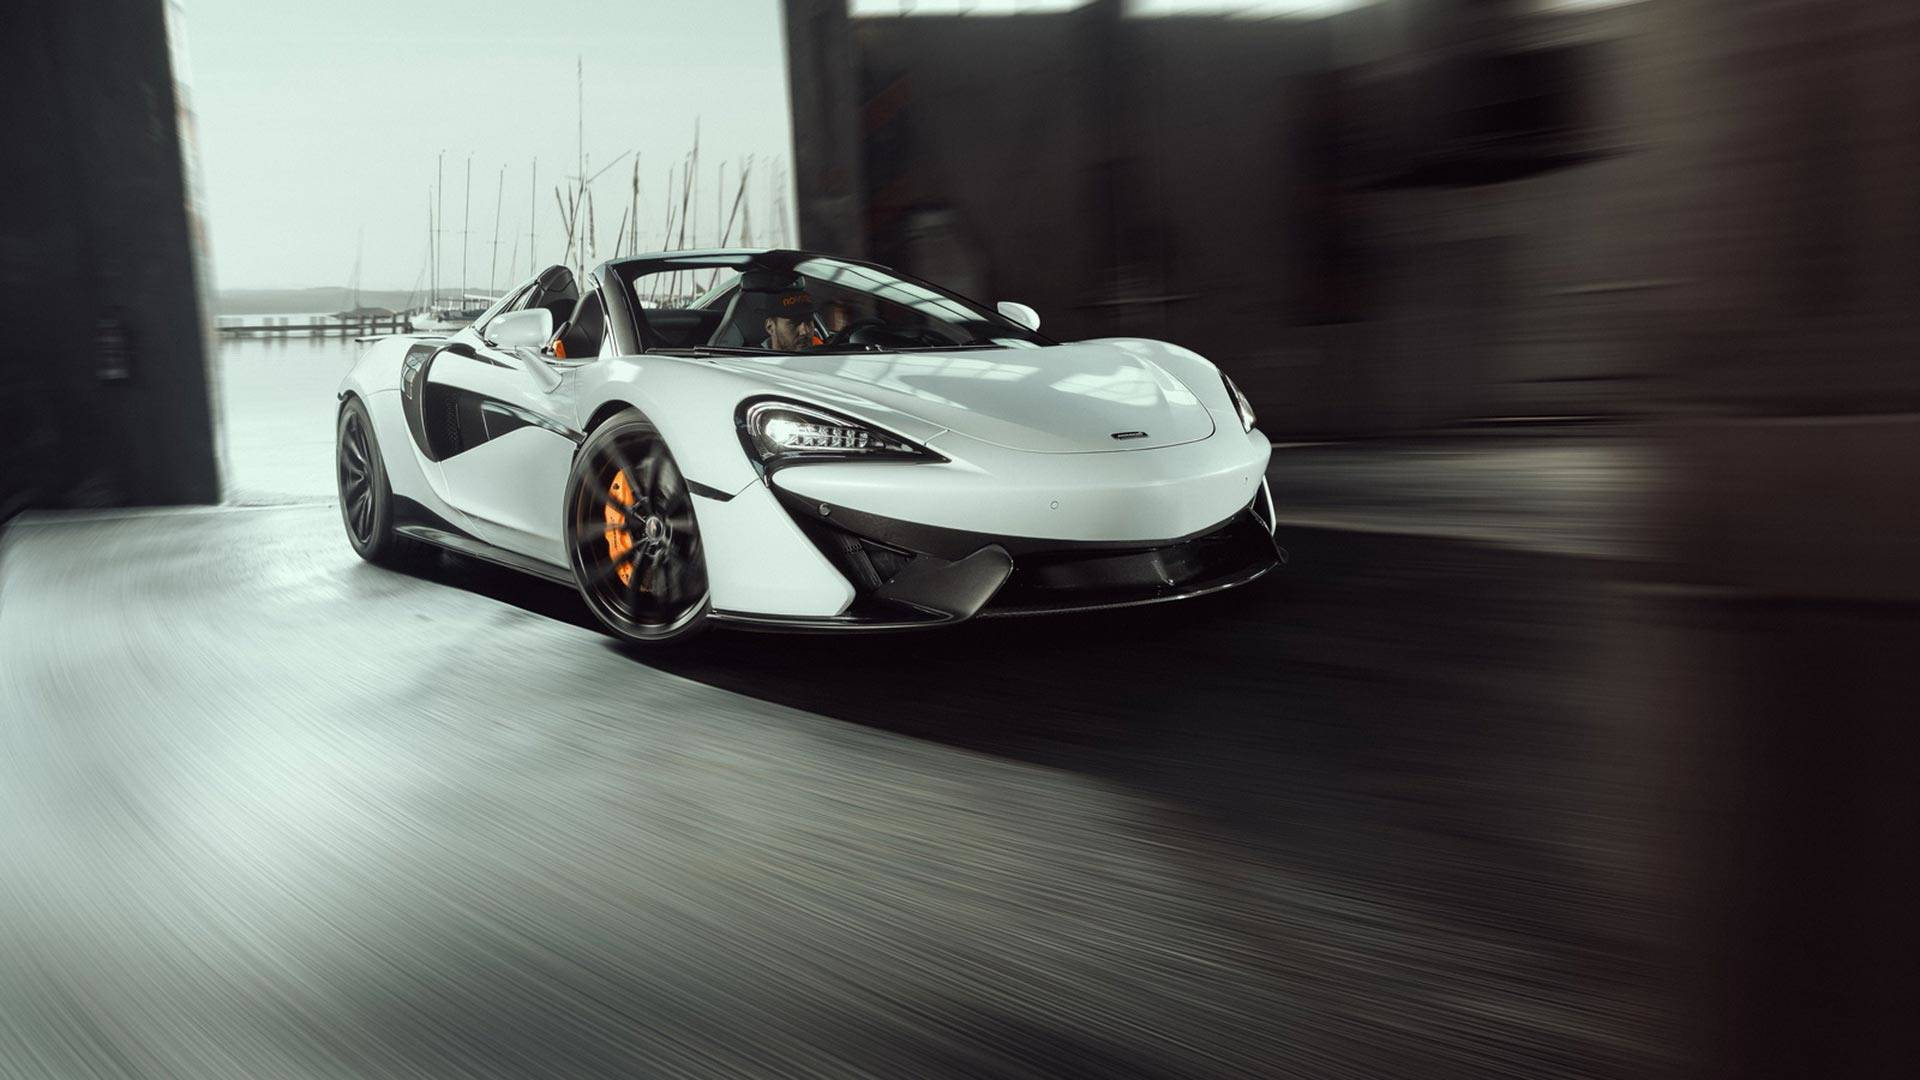 2018 NOVITEC McLaren 570S Spider Front Three-Quarter Wallpapers (1)